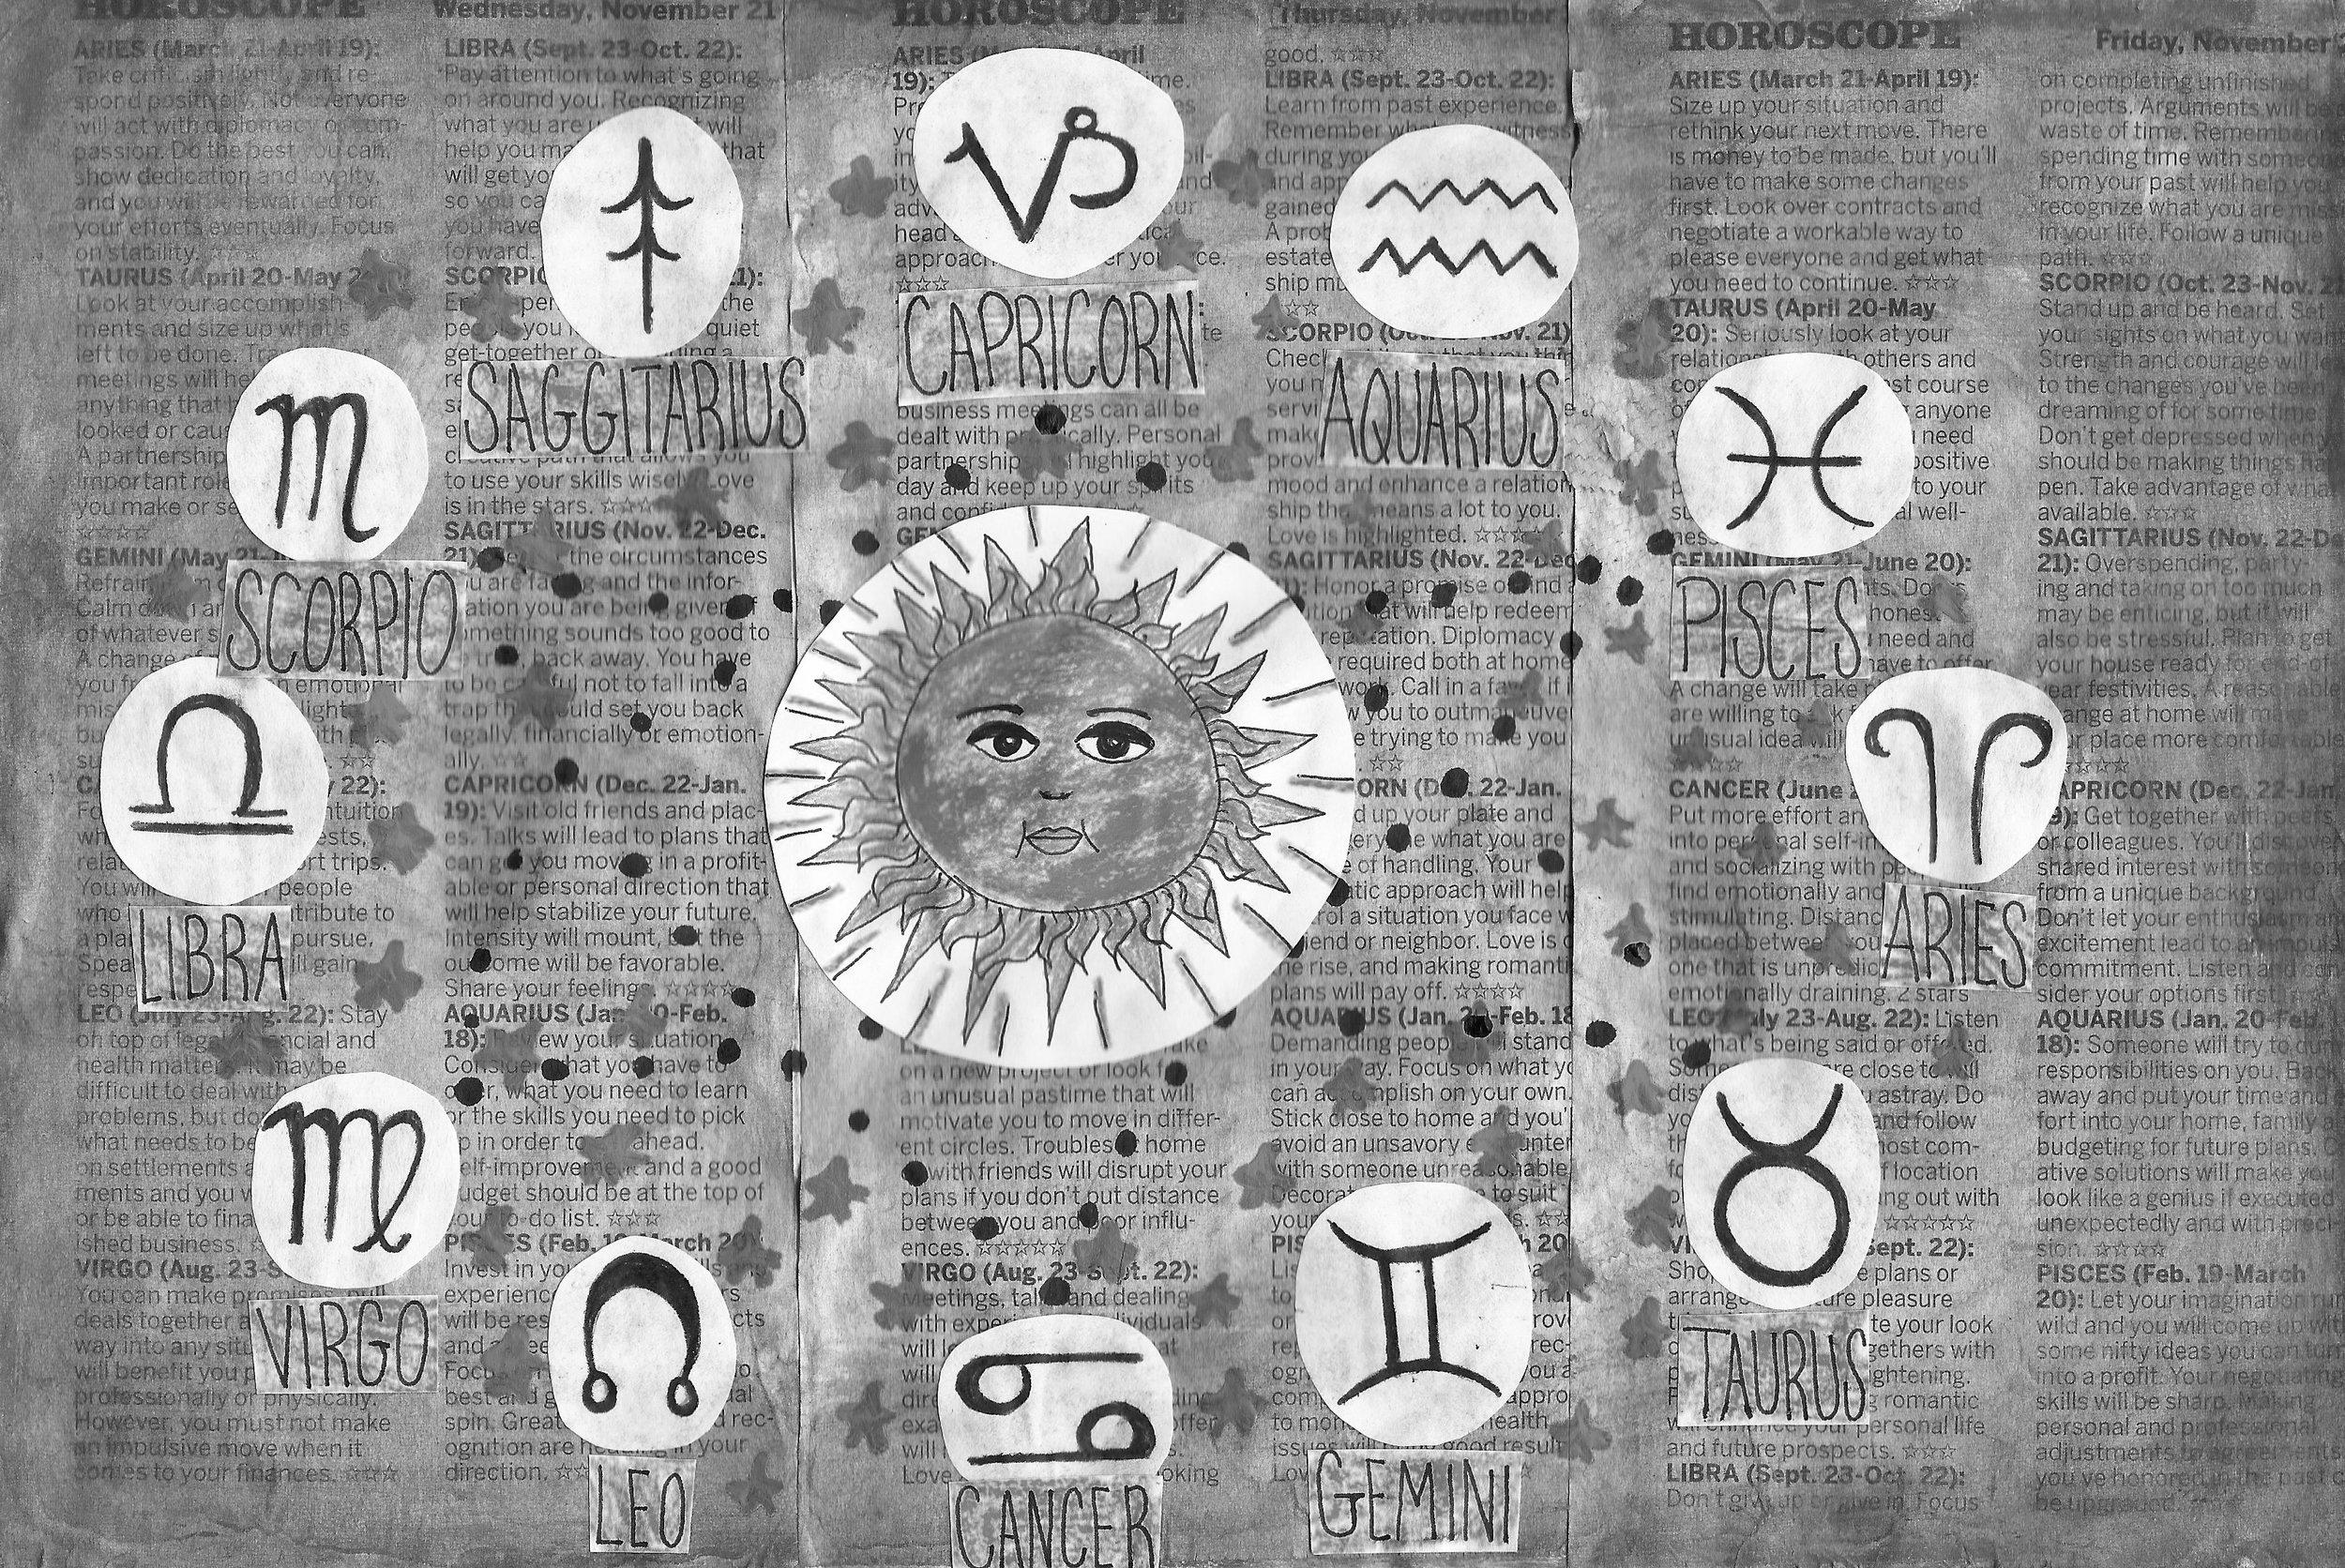 Original Link: http://www.buzzsawmag.org/media/2012/12/KarissaBreuer_Horoscope.jpg